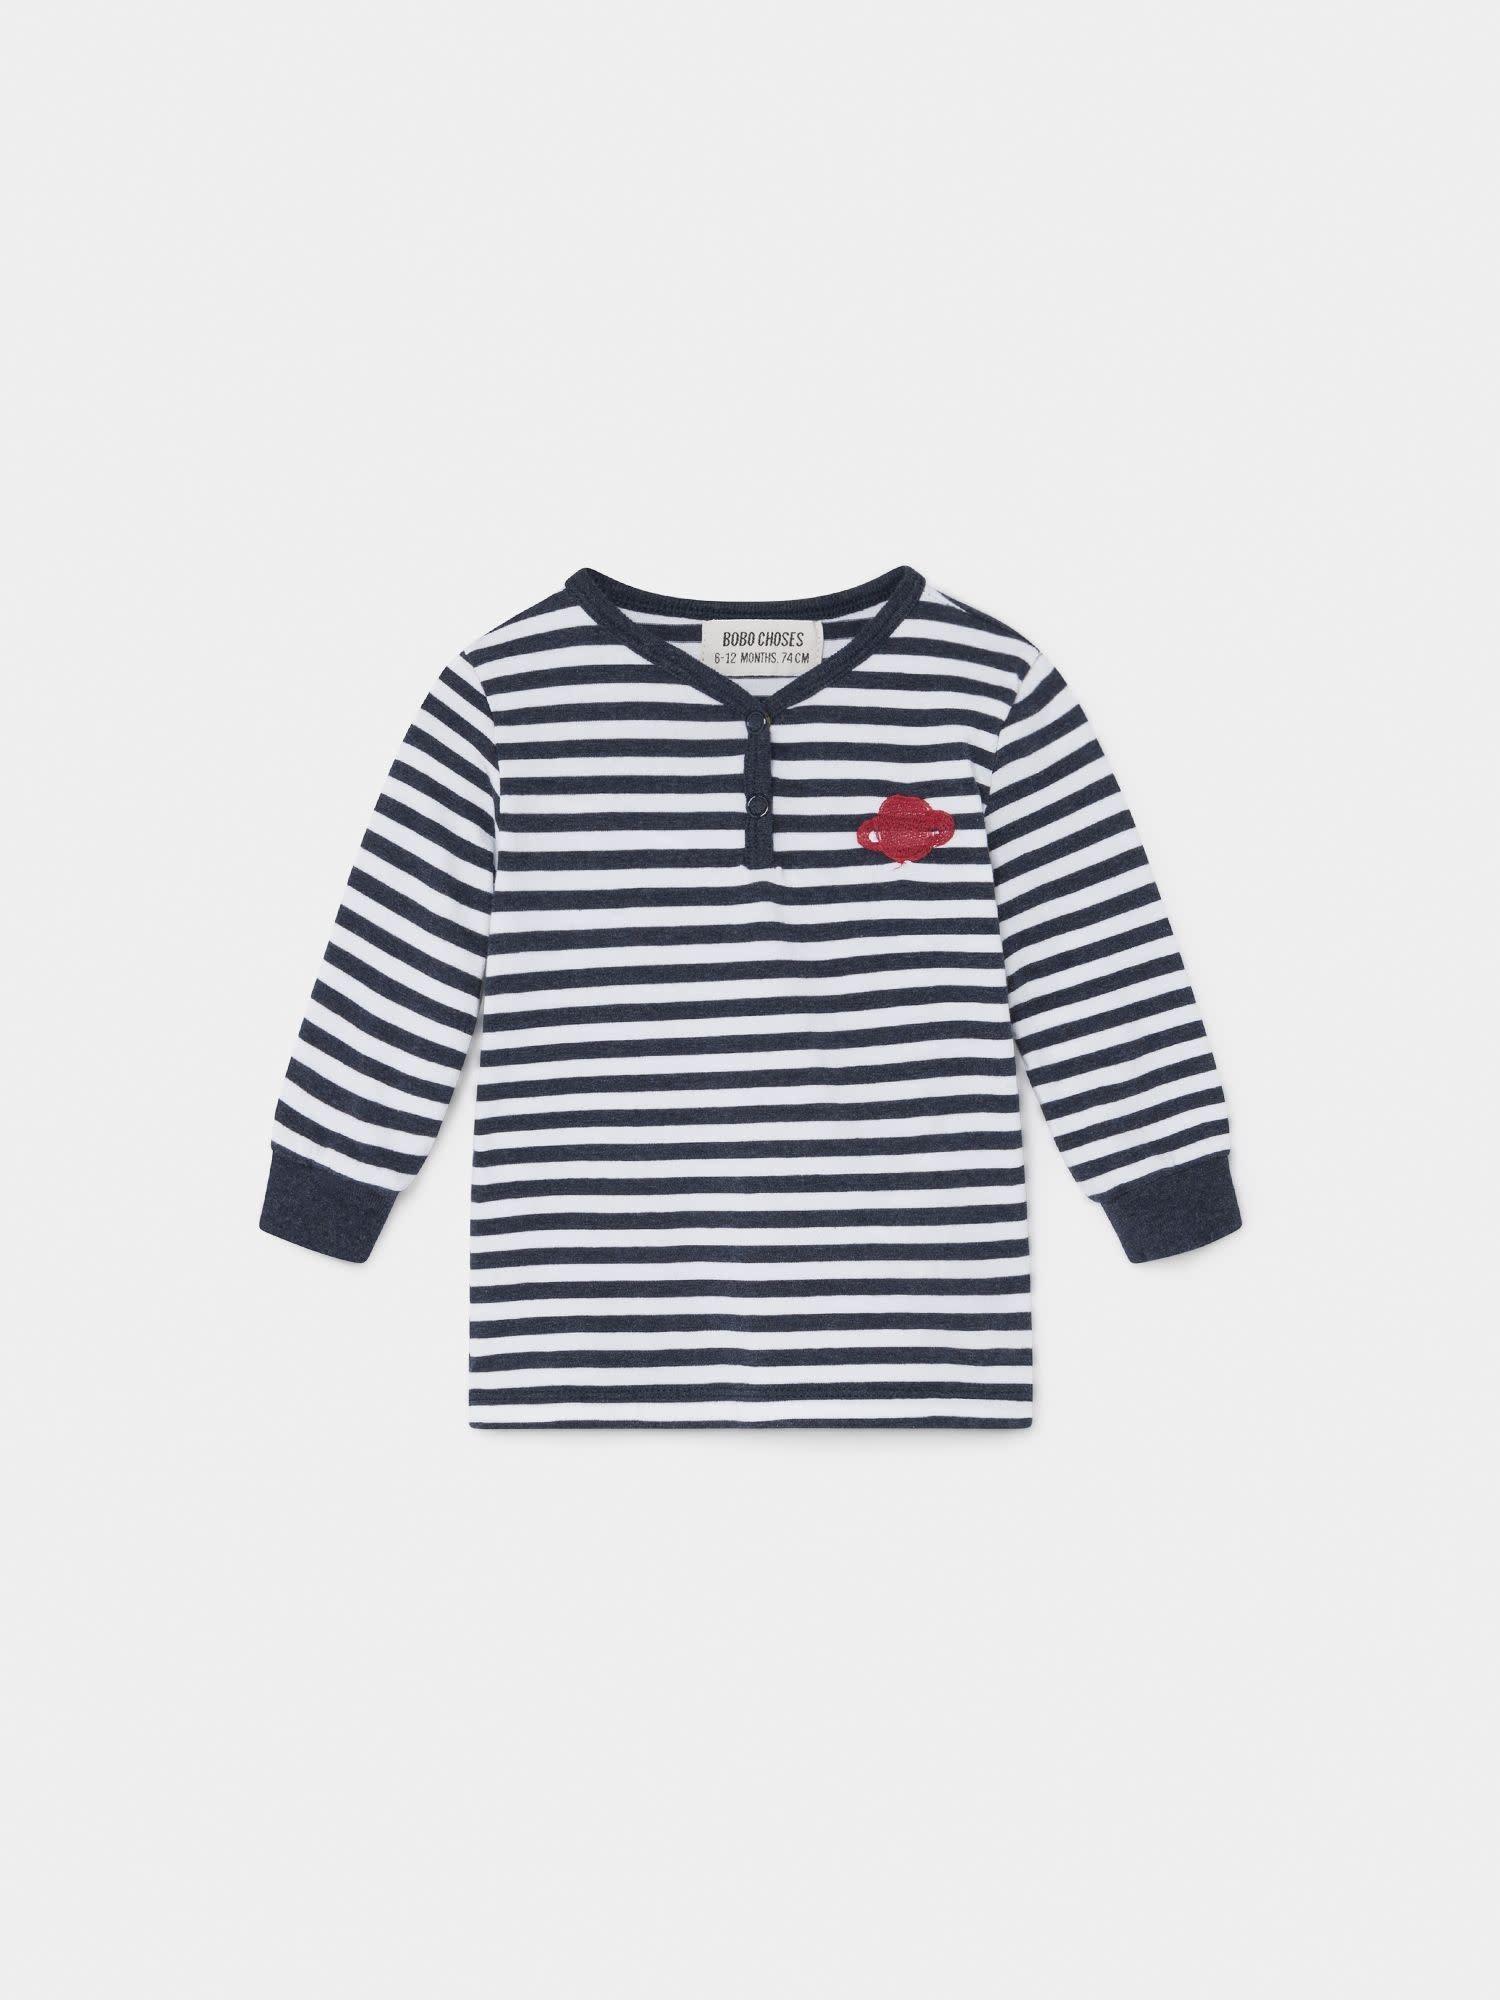 BOBO CHOSES Saturn Buttons T-Shirt